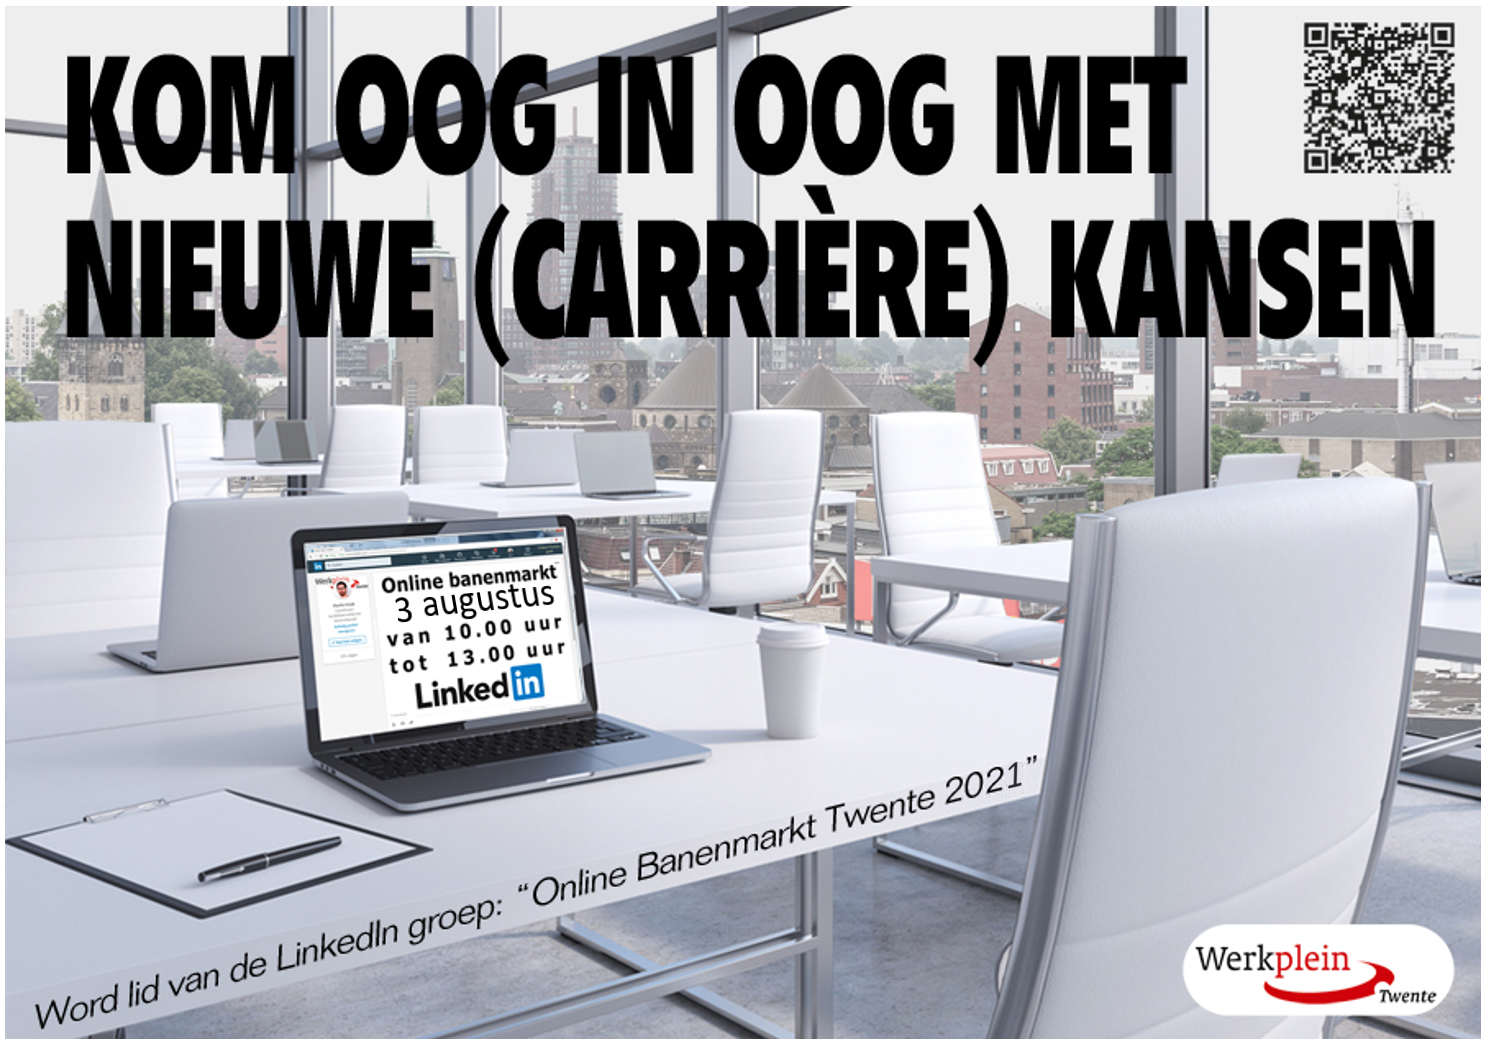 Online banenmarkt twente